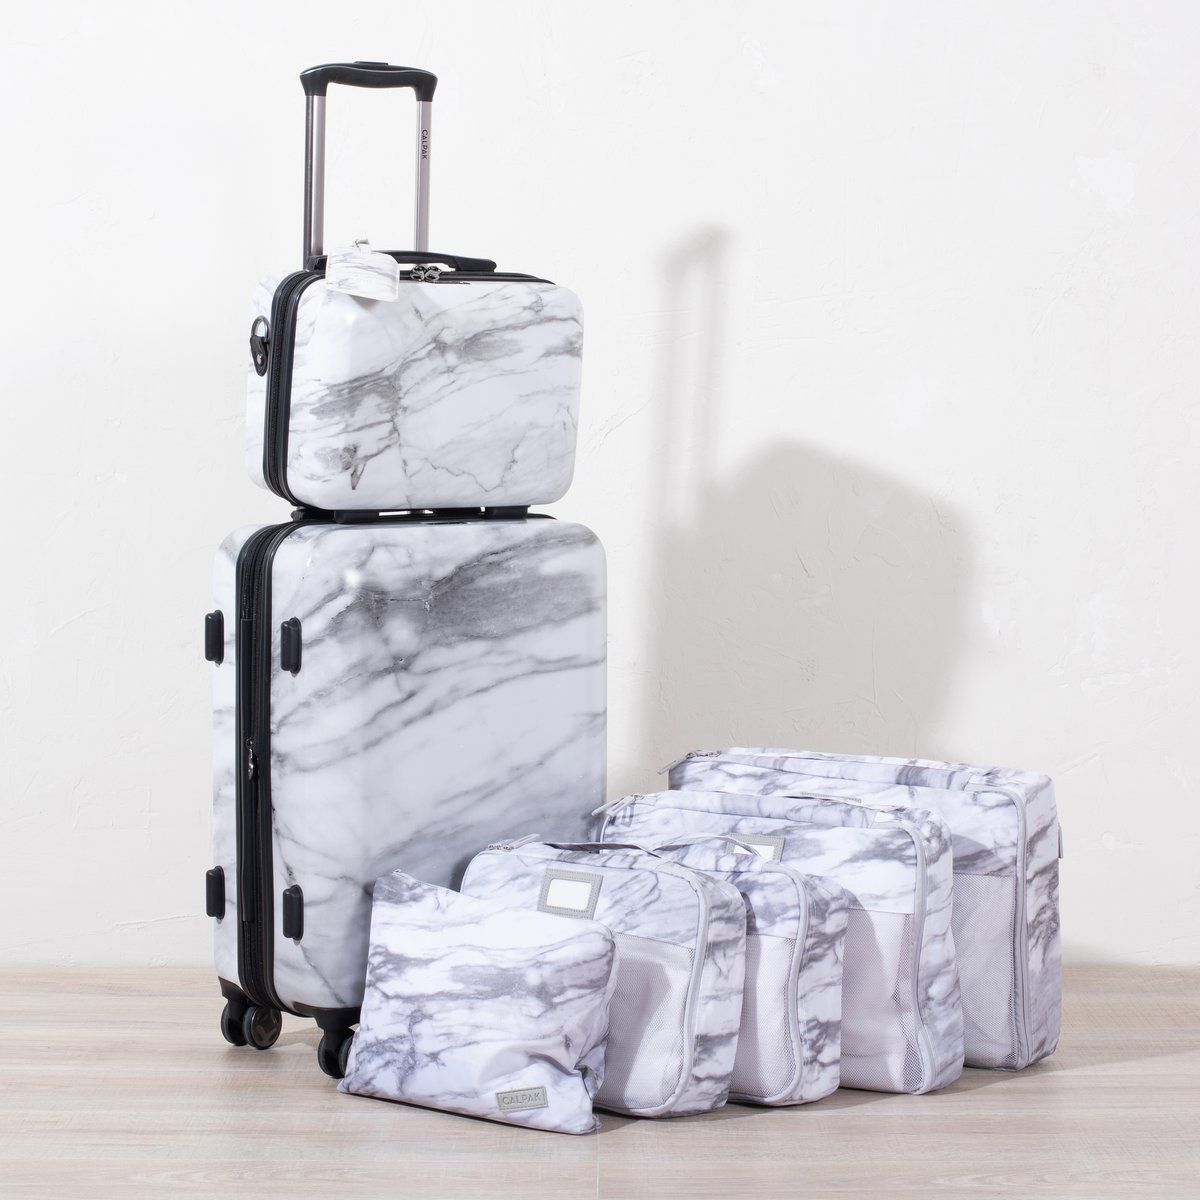 vali du lịch - vali marble